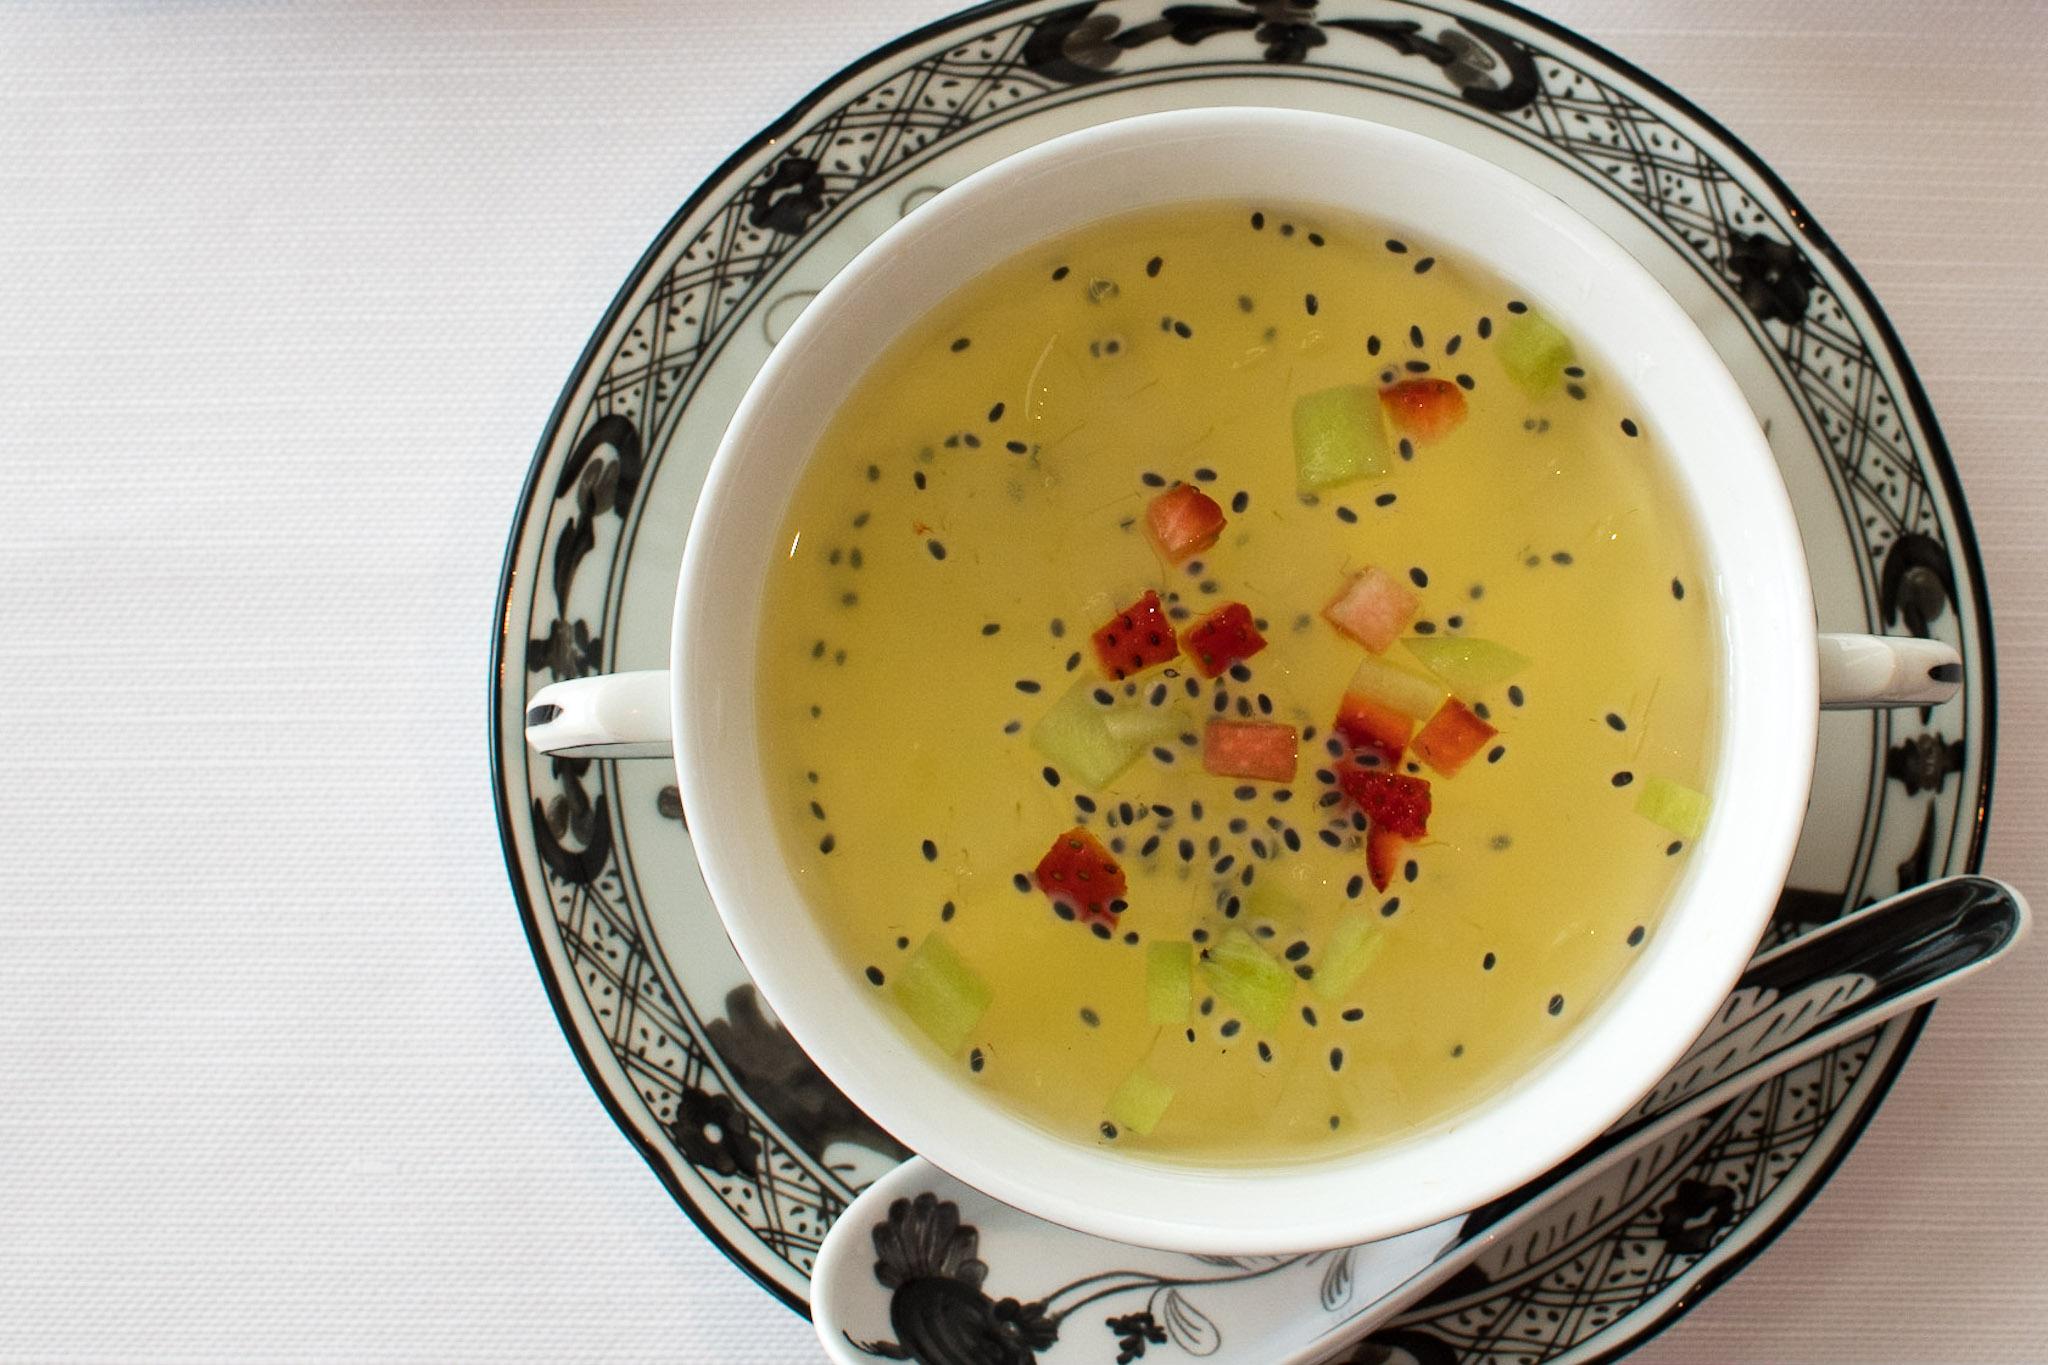 Chilled Aloe Vera, Kiwi, Strawberries, Lime Juice   Michelin Star Menu (Lunch) -The Ritz-Carlton, Millenia Singapore